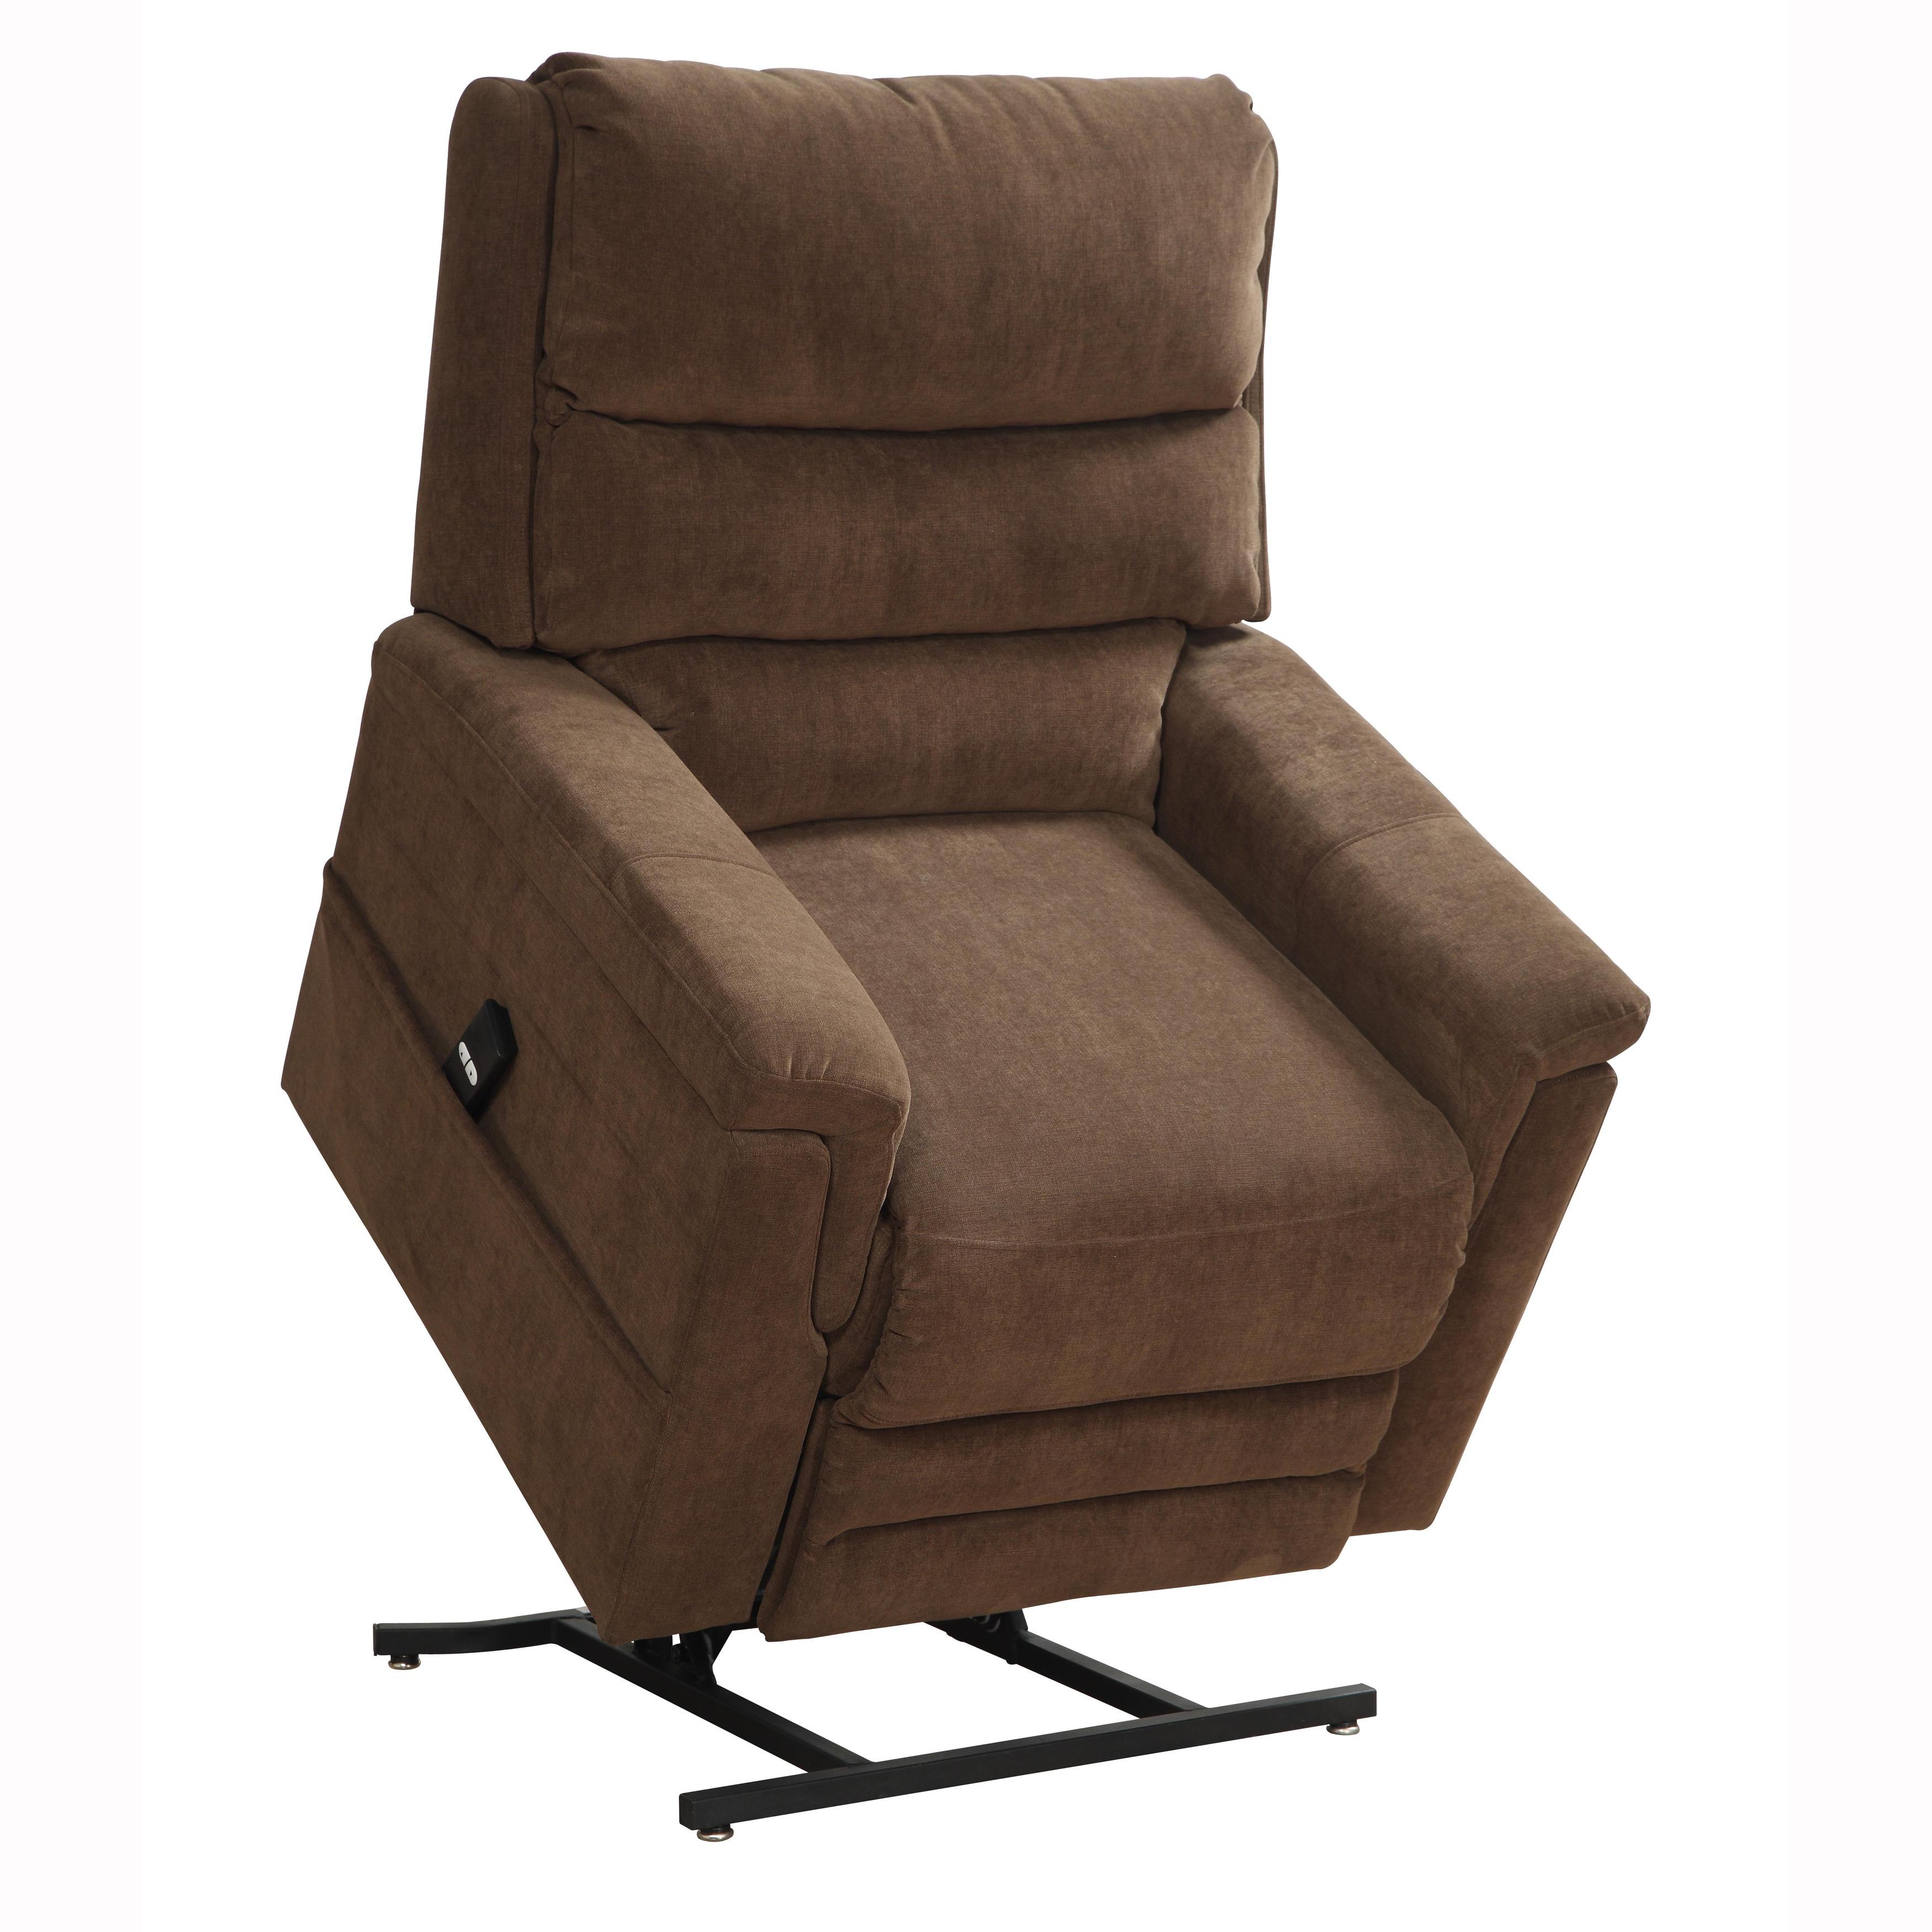 Myles Brown Fabric Power Lift Chair Recliner Overstock